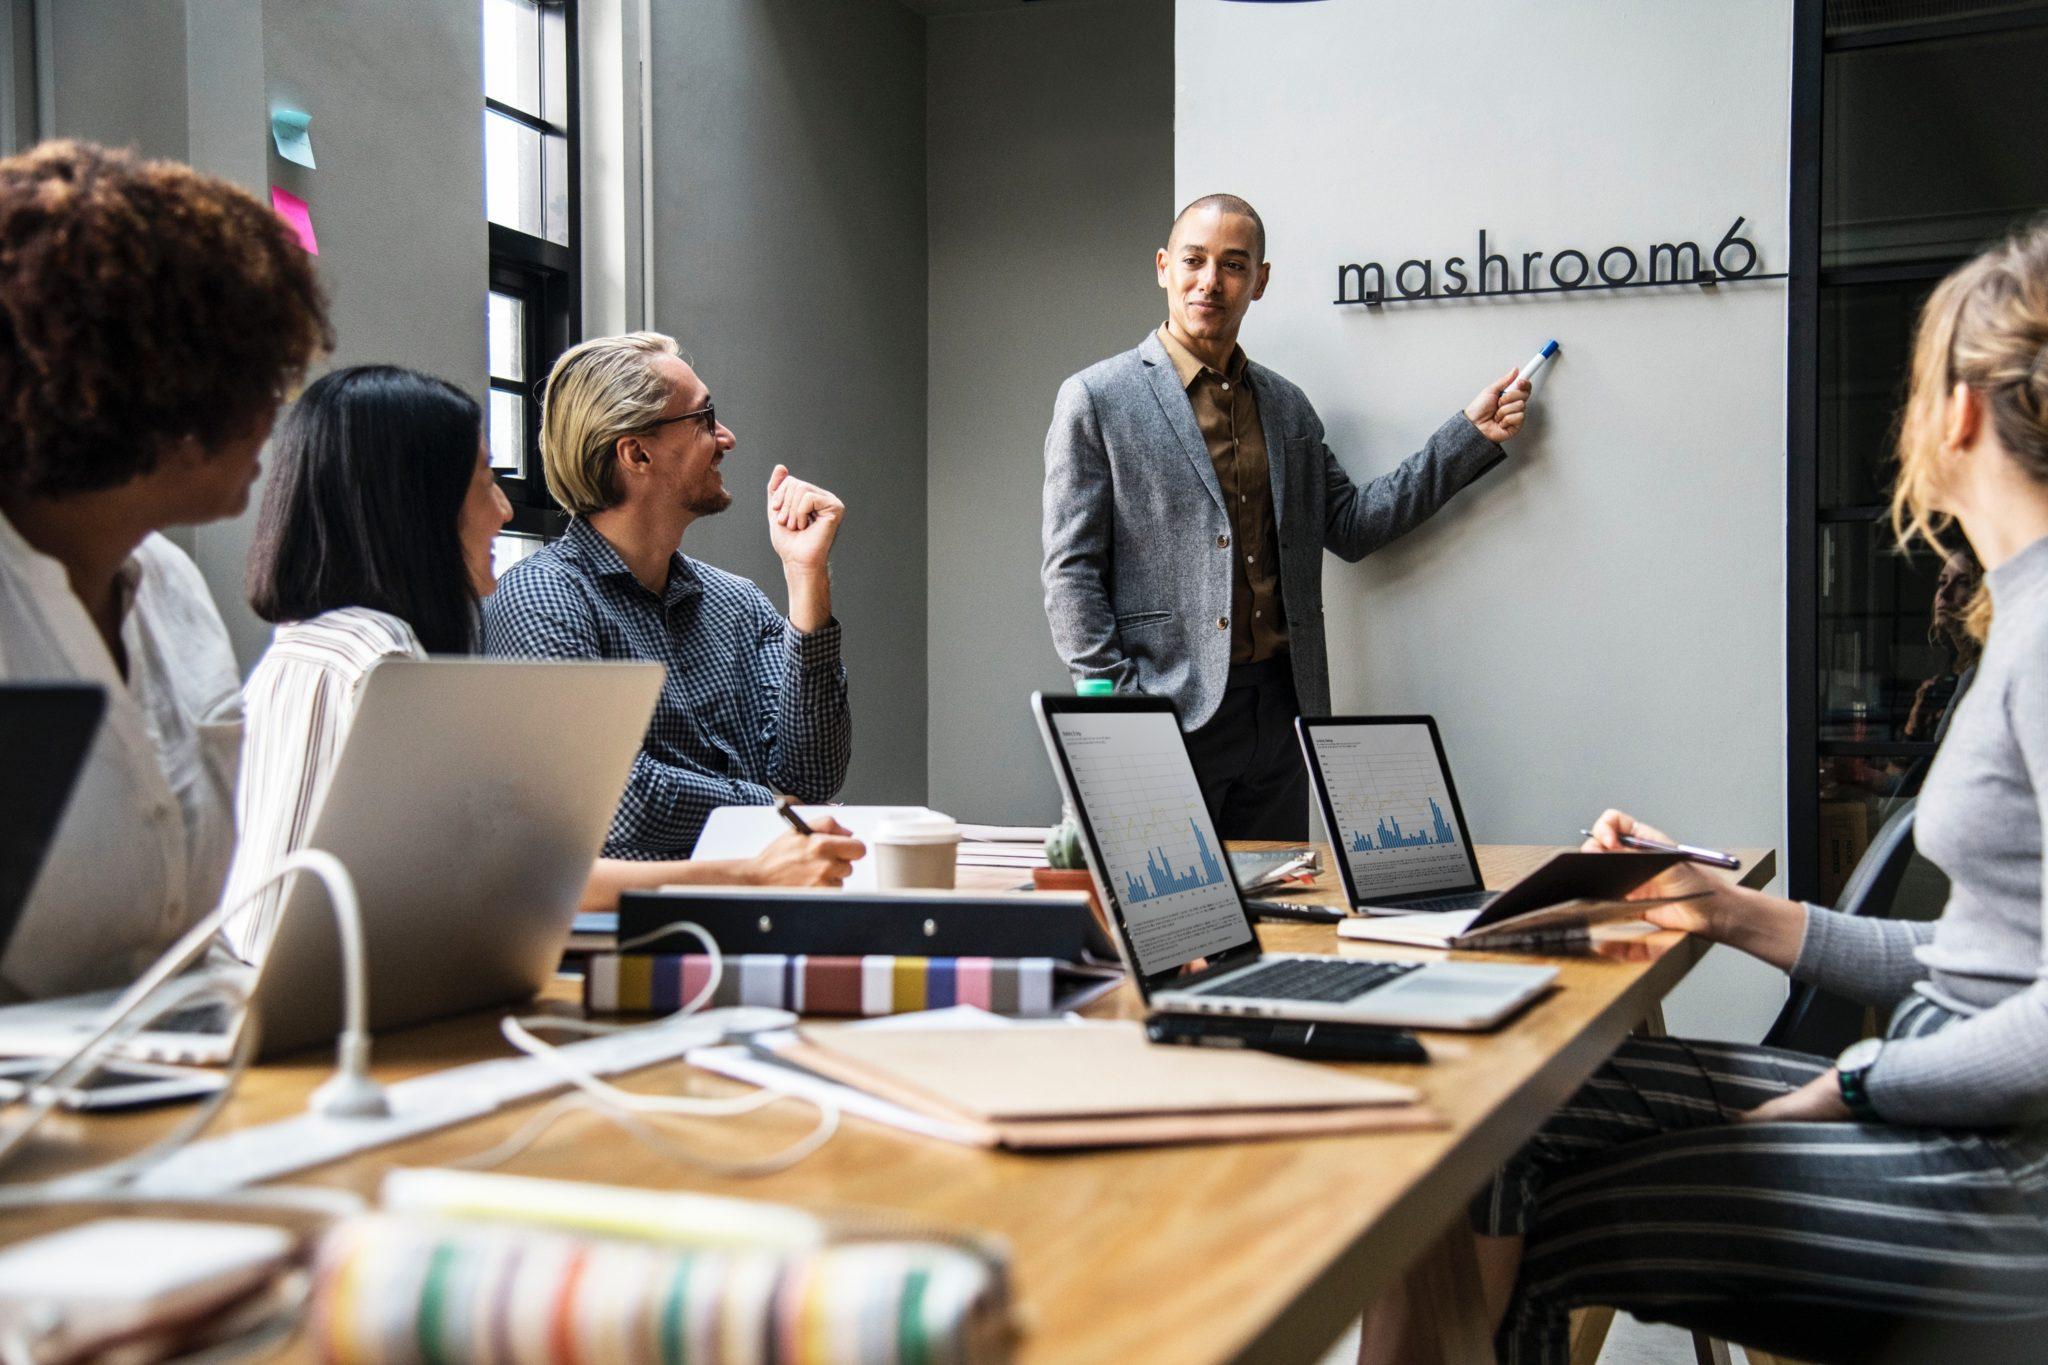 marketing recruiters digital marketing headhunters